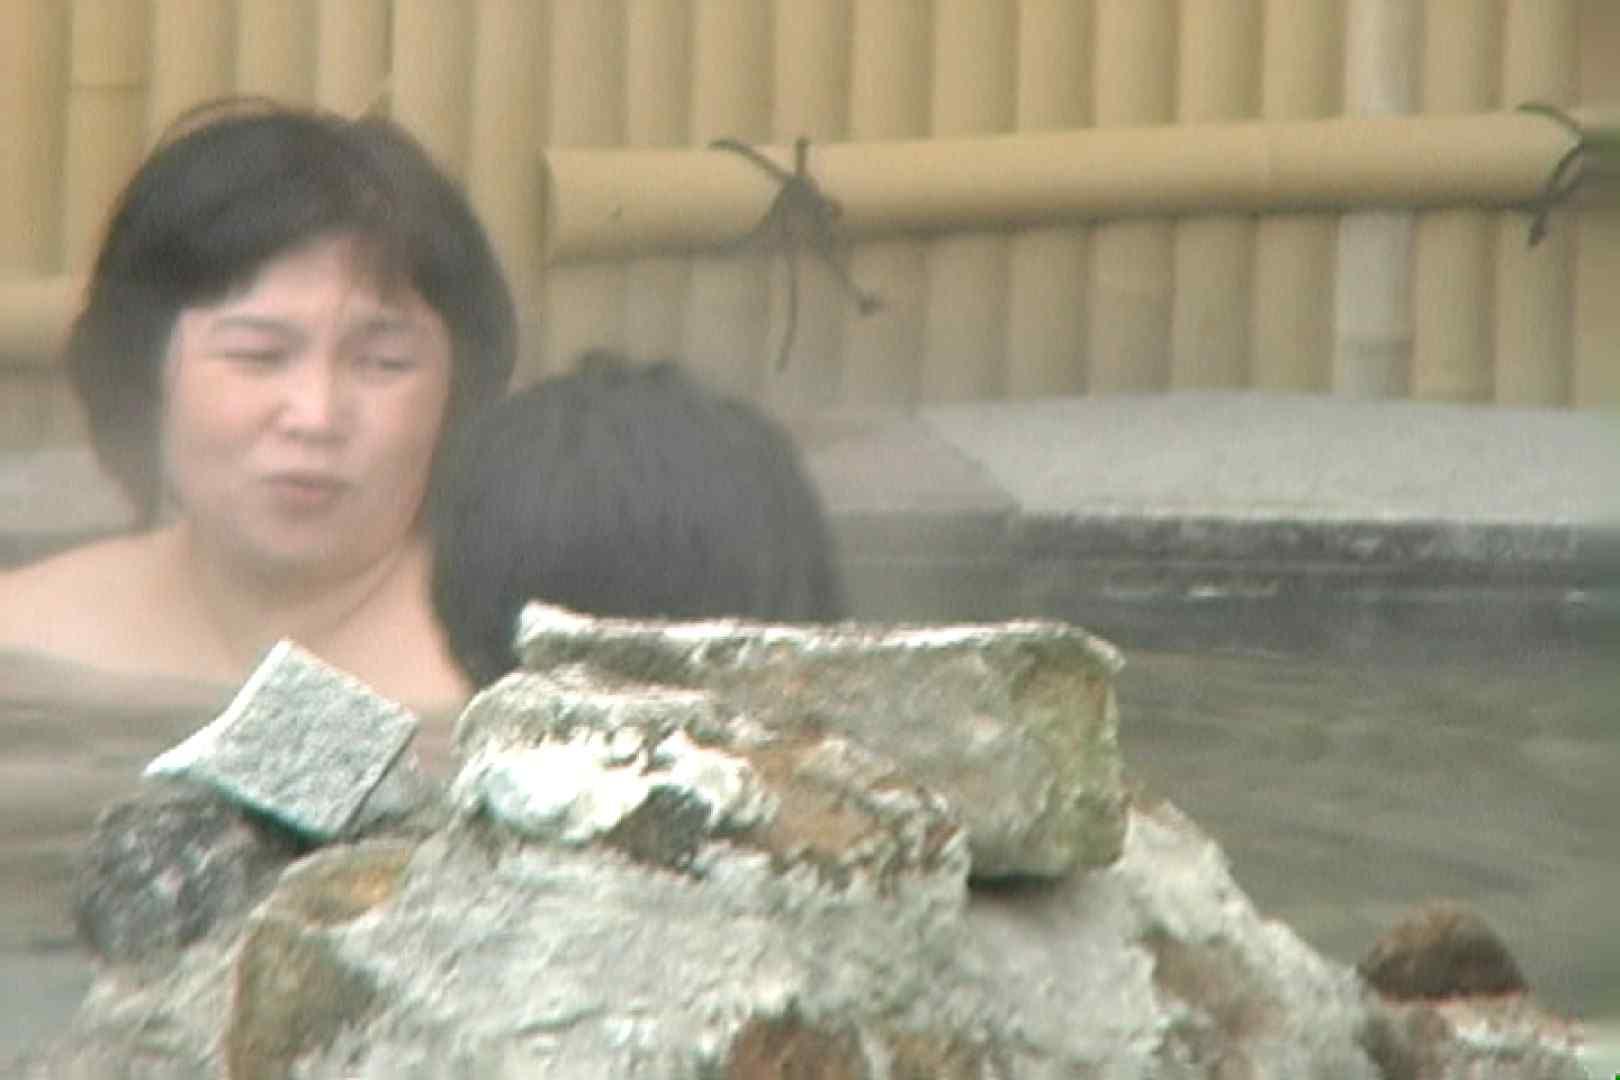 Aquaな露天風呂Vol.646 OLセックス | 盗撮  97画像 97